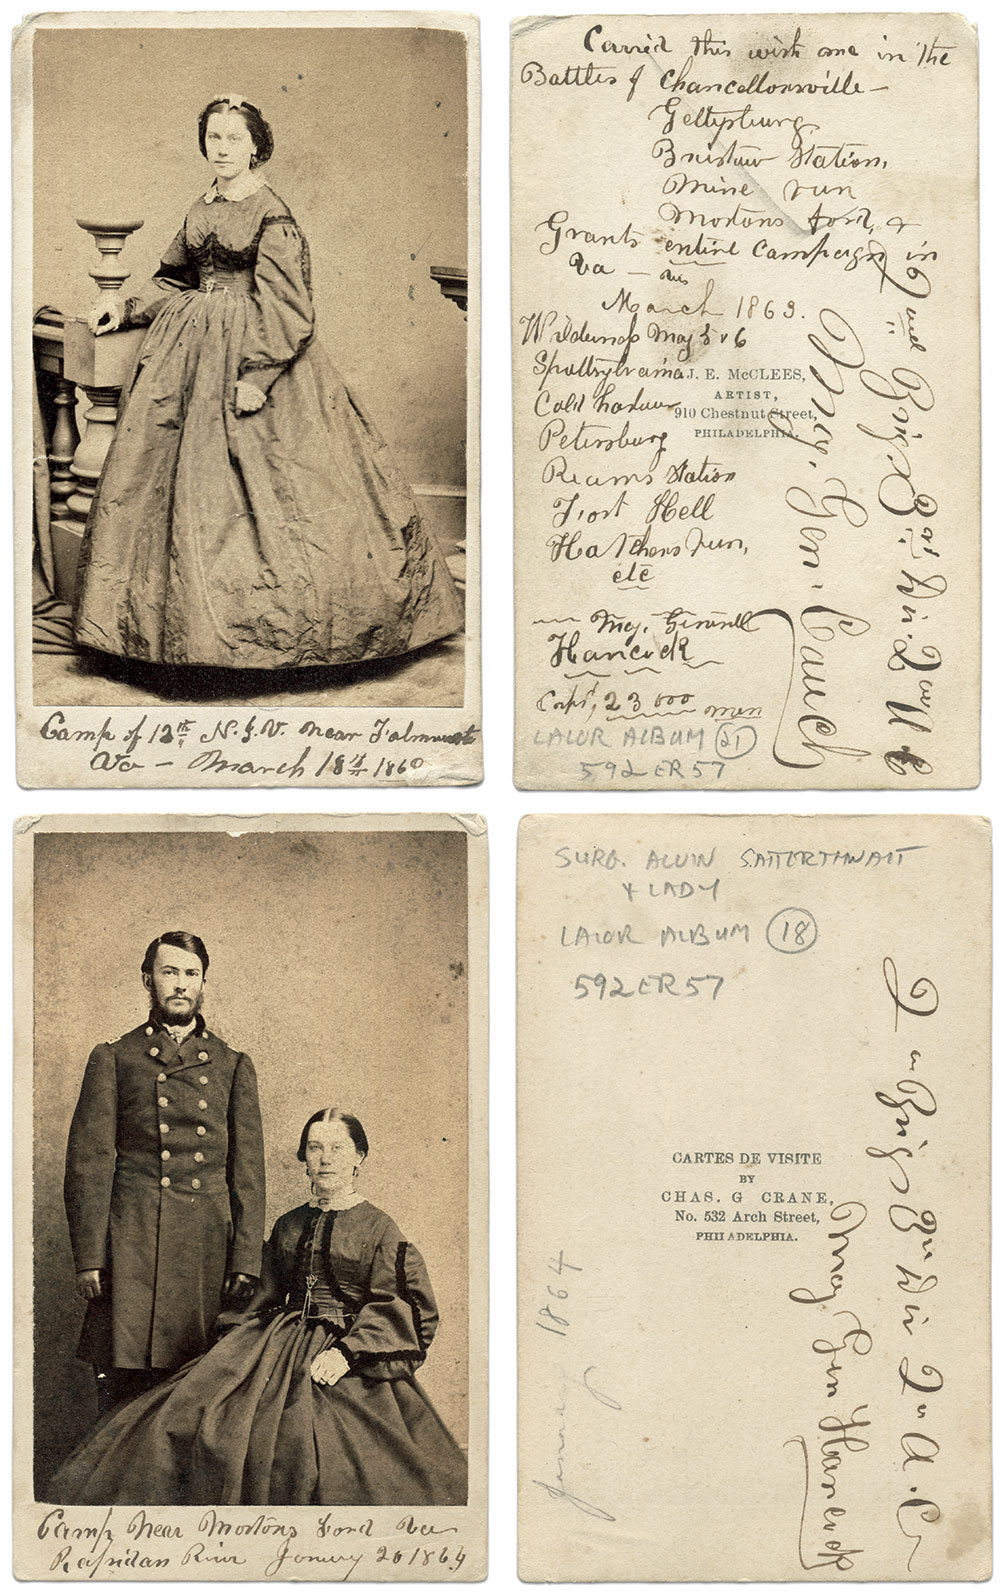 Cartes de visite by Philadelphia photographers James E. McClees, right, and Charles G. Crane.